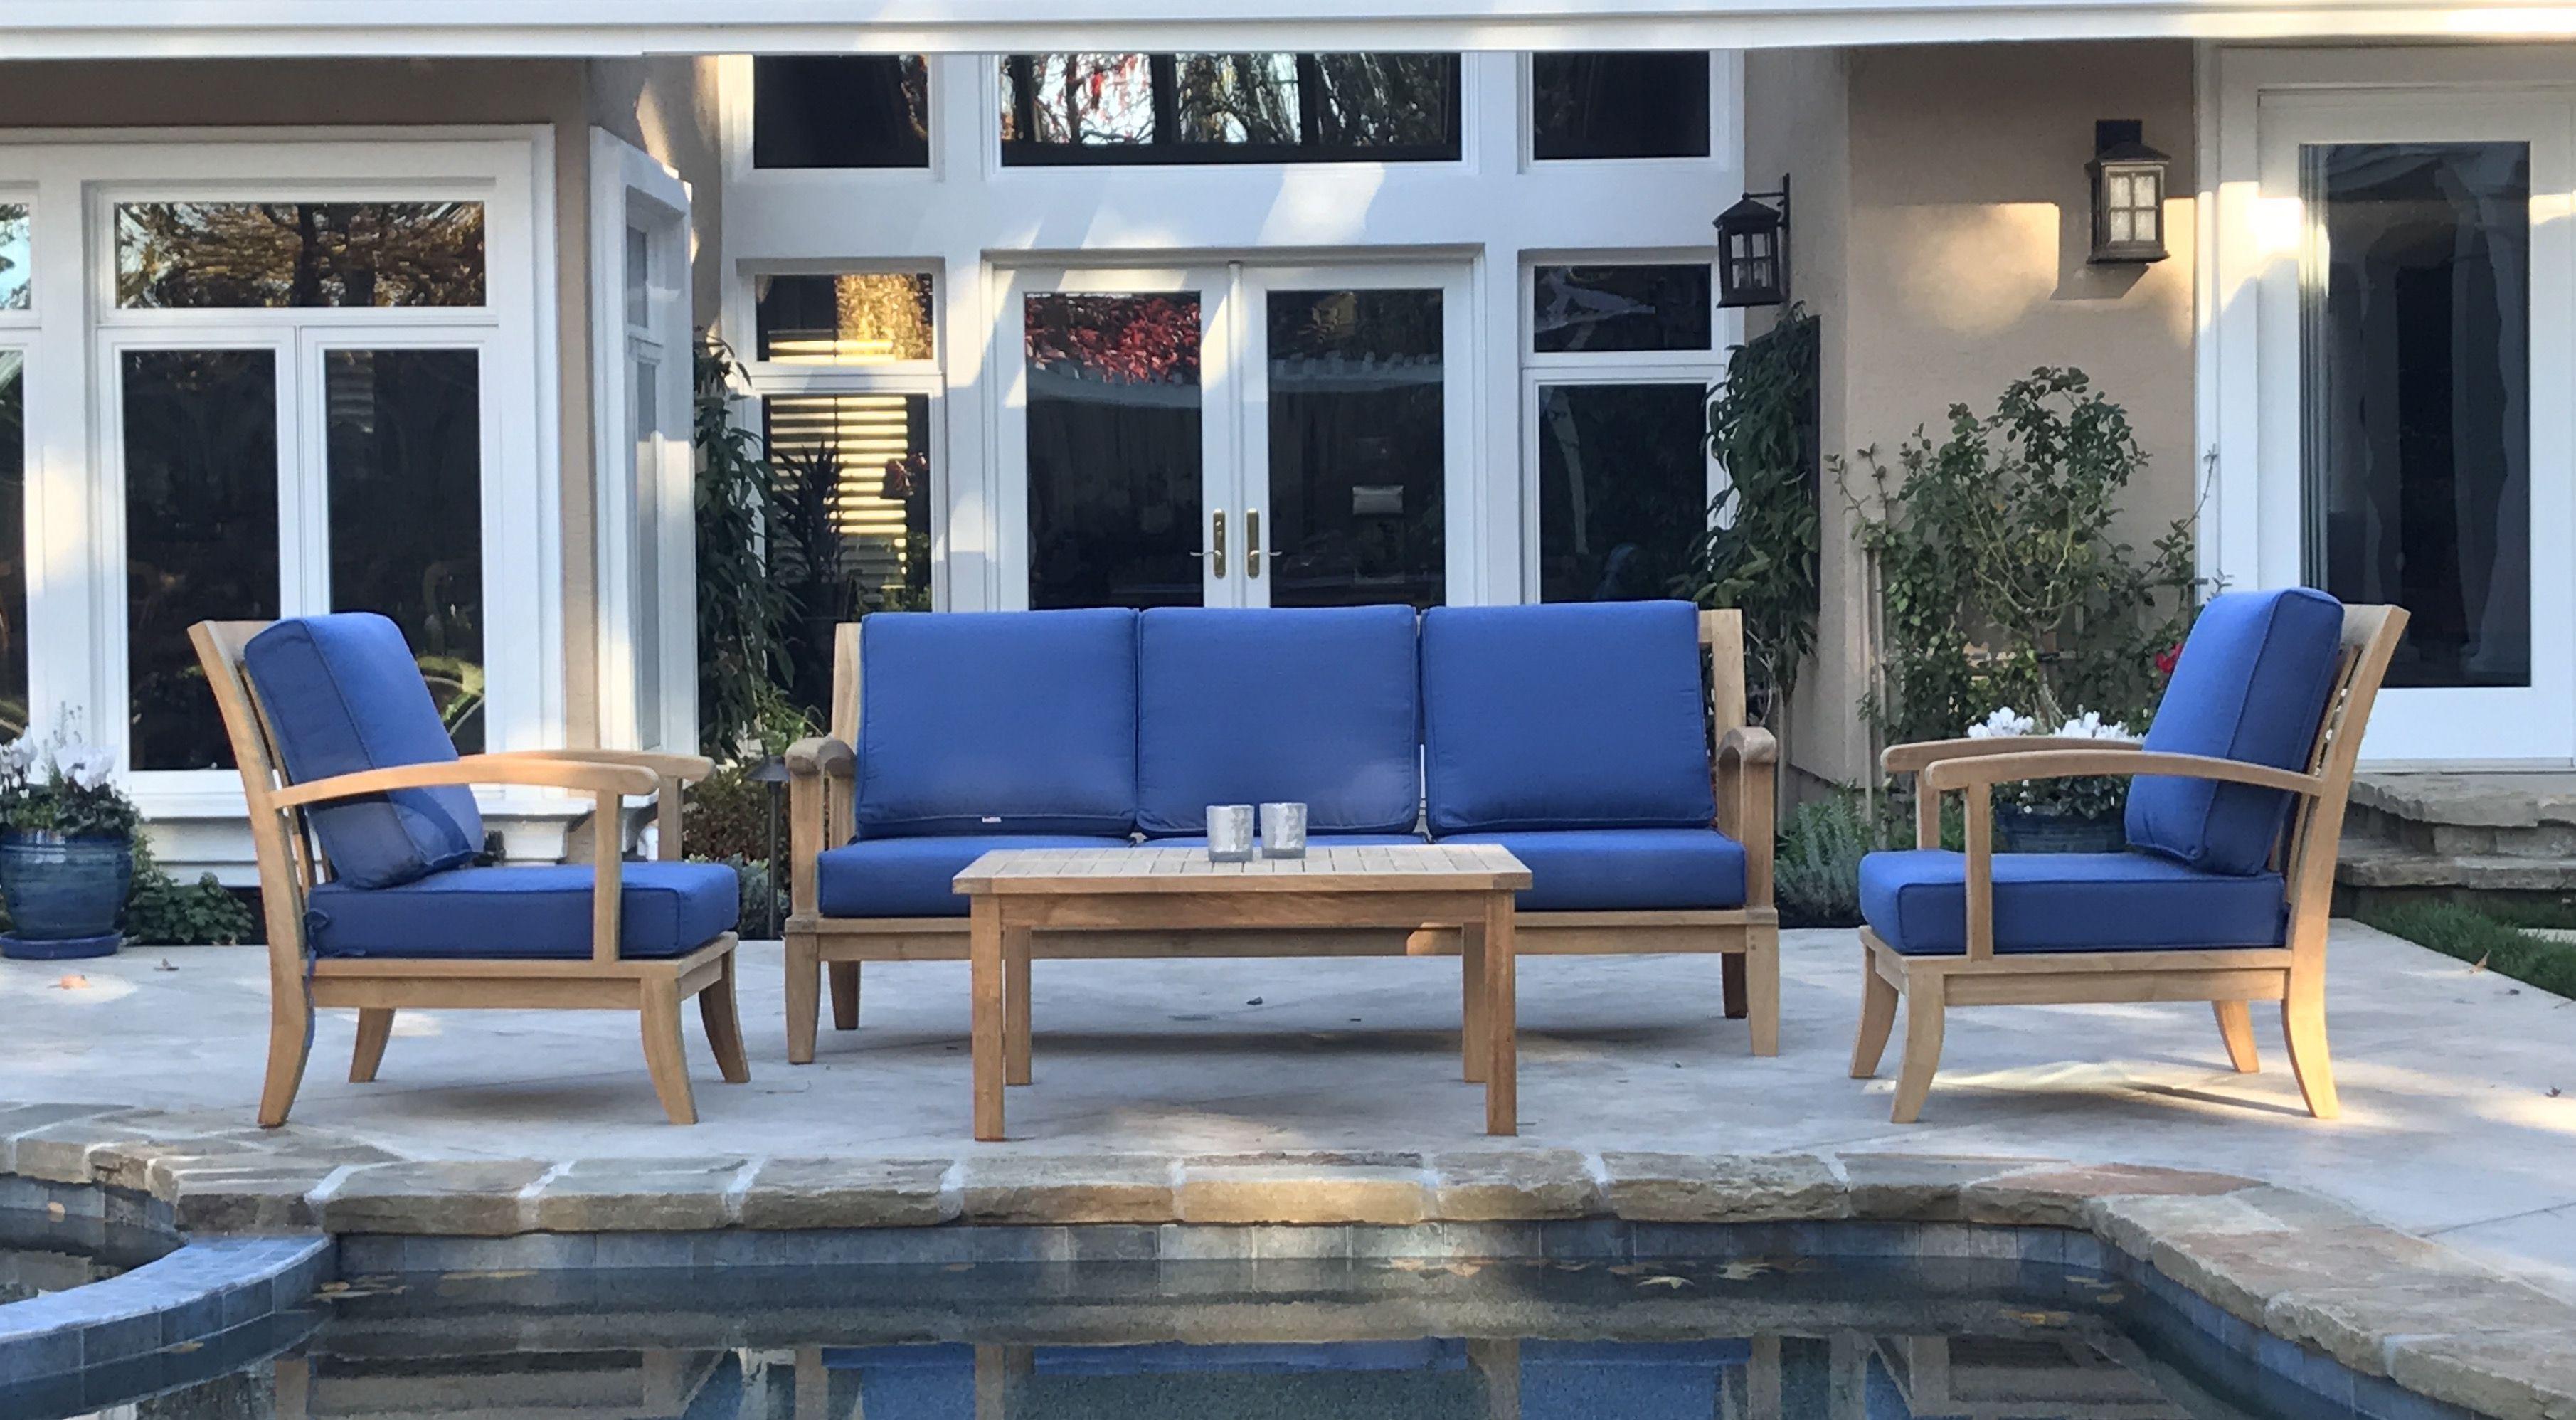 Teak deep seating club chair sofa | Teak deep seating | Pinterest | Teak